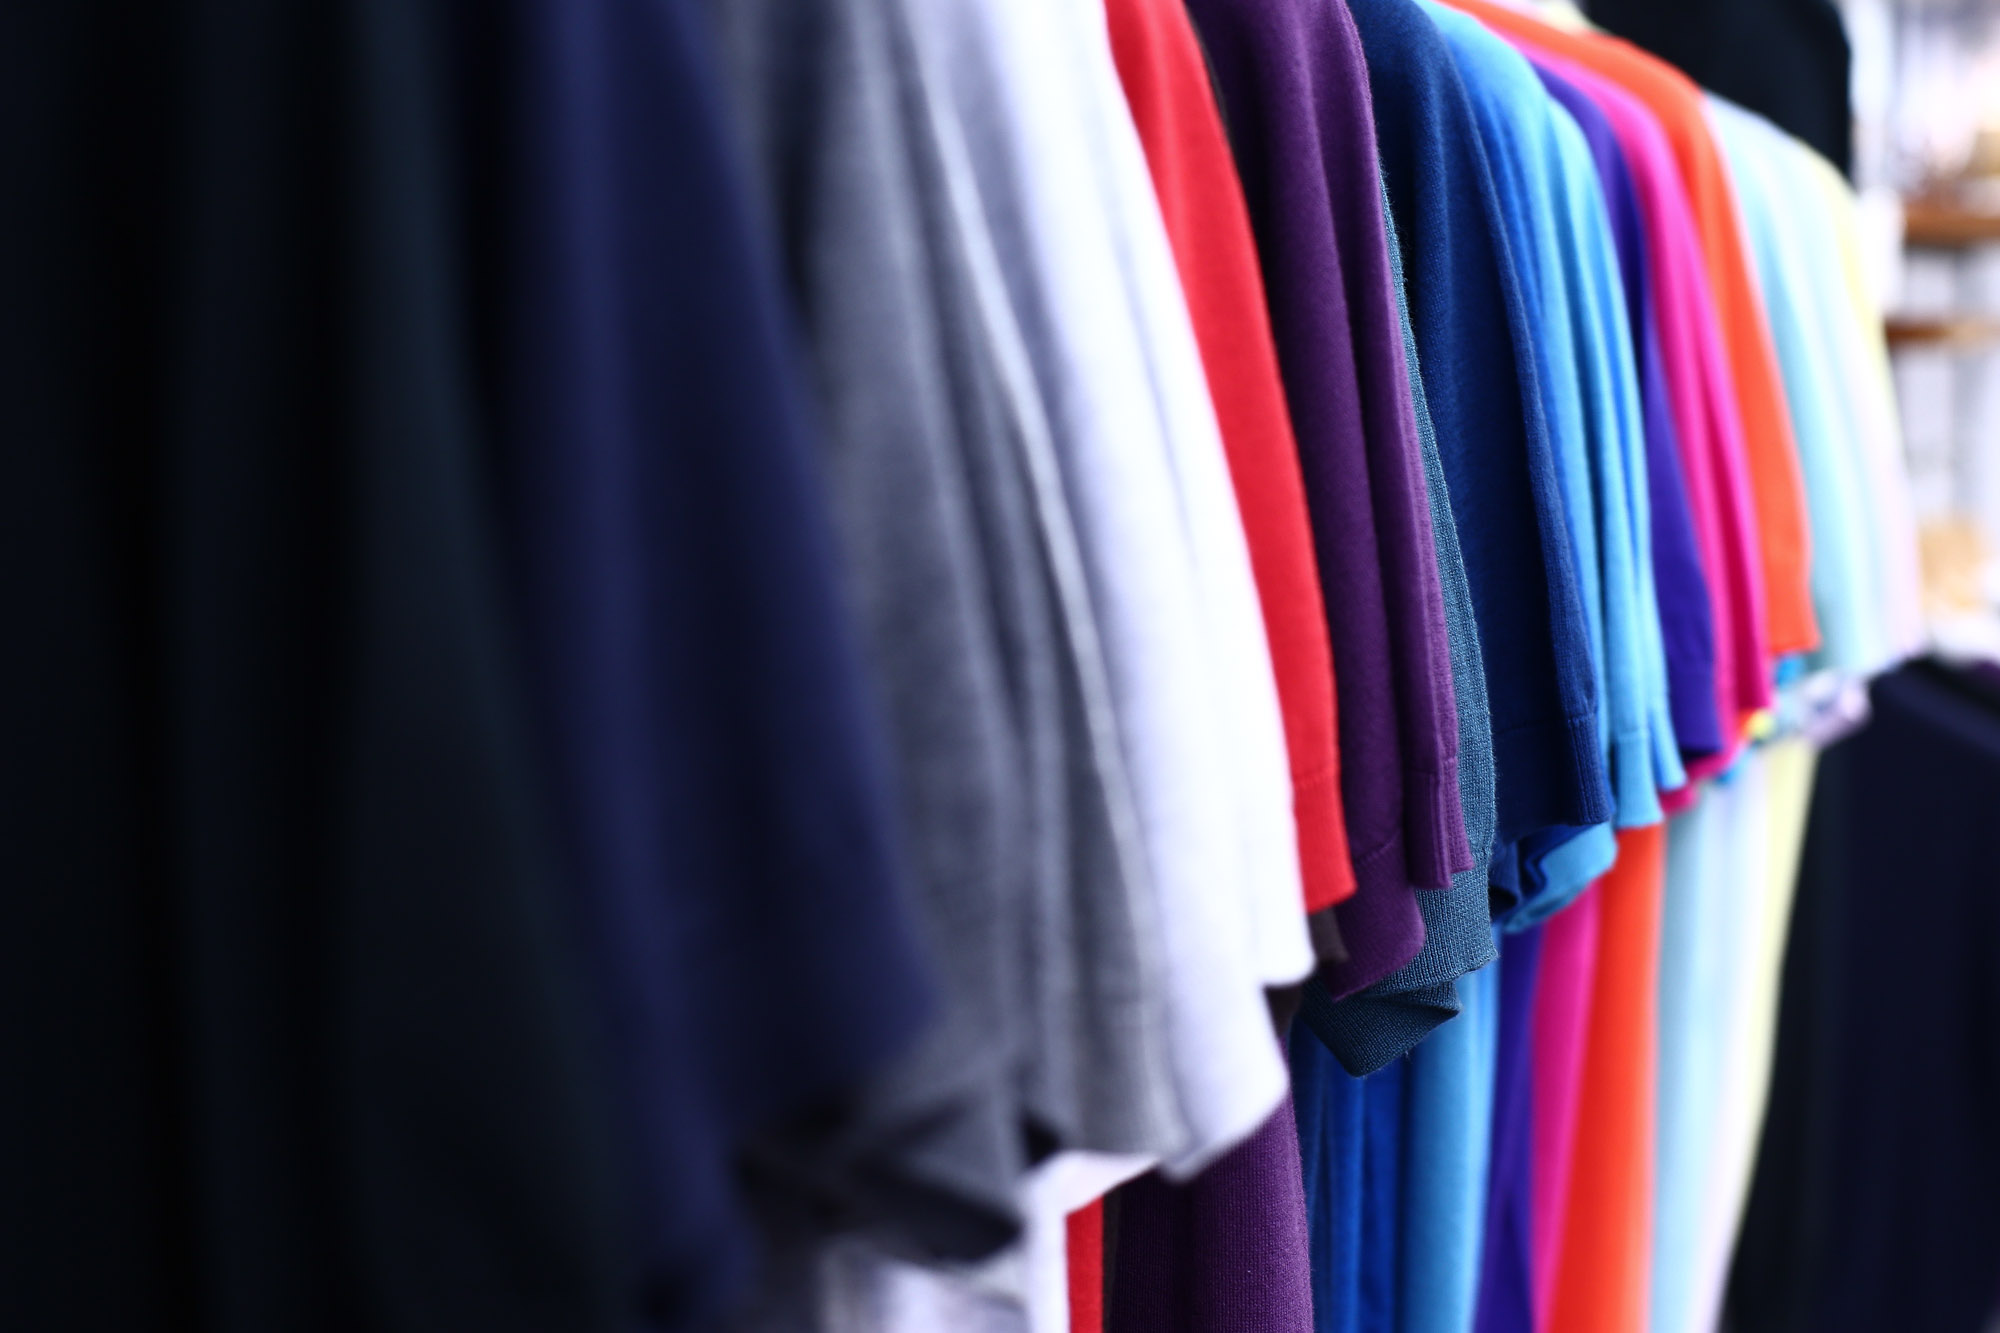 JOHN SMEDLEY ジョンスメドレー 日本企画 愛知 名古屋 ZODIAC ゾディアック ニット ポロシャツ ソックス カーディガン ニットパーカー